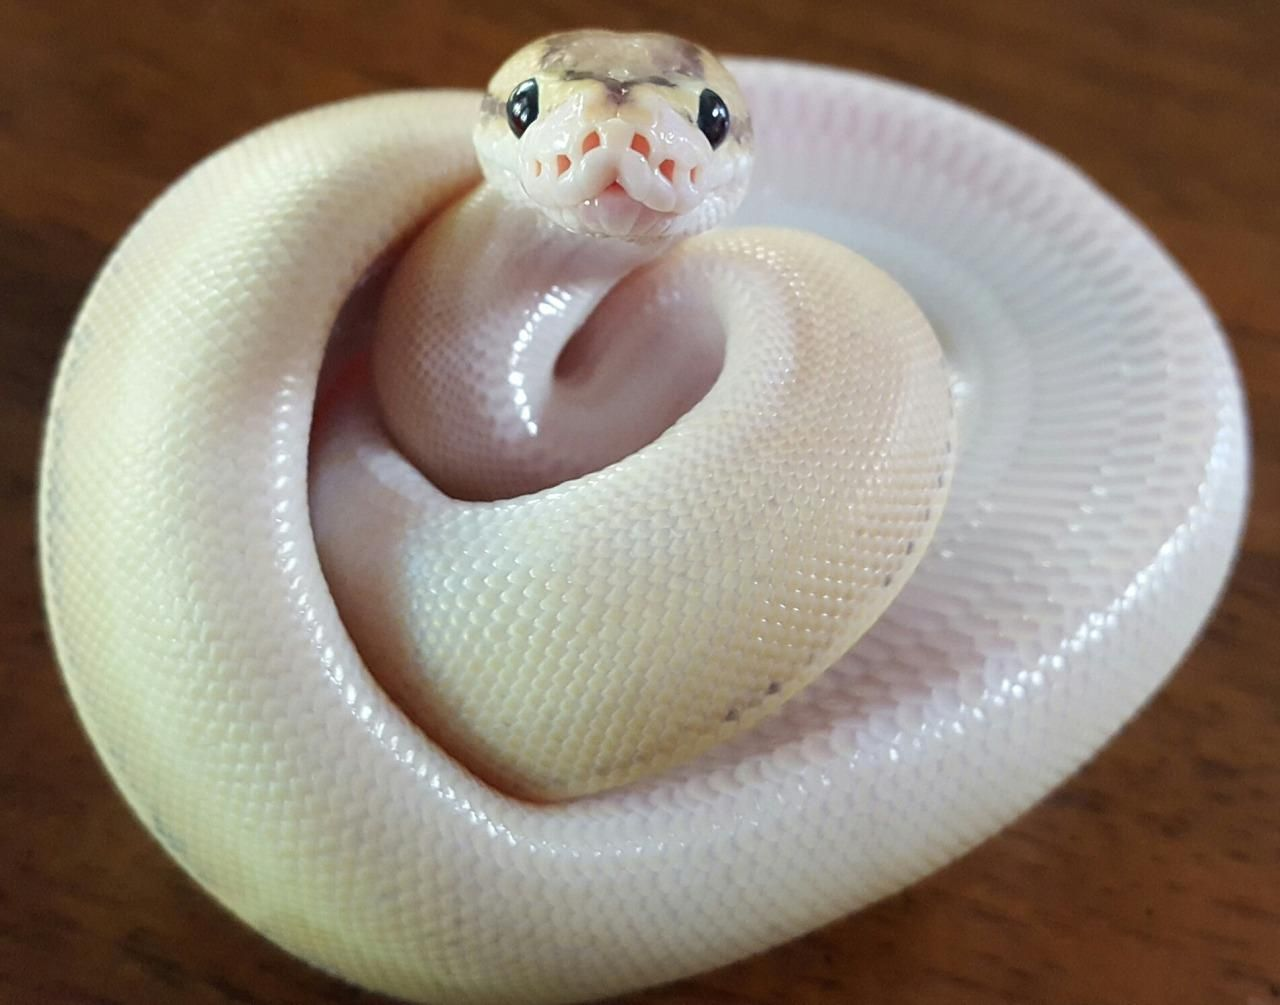 Baby snake smiles!